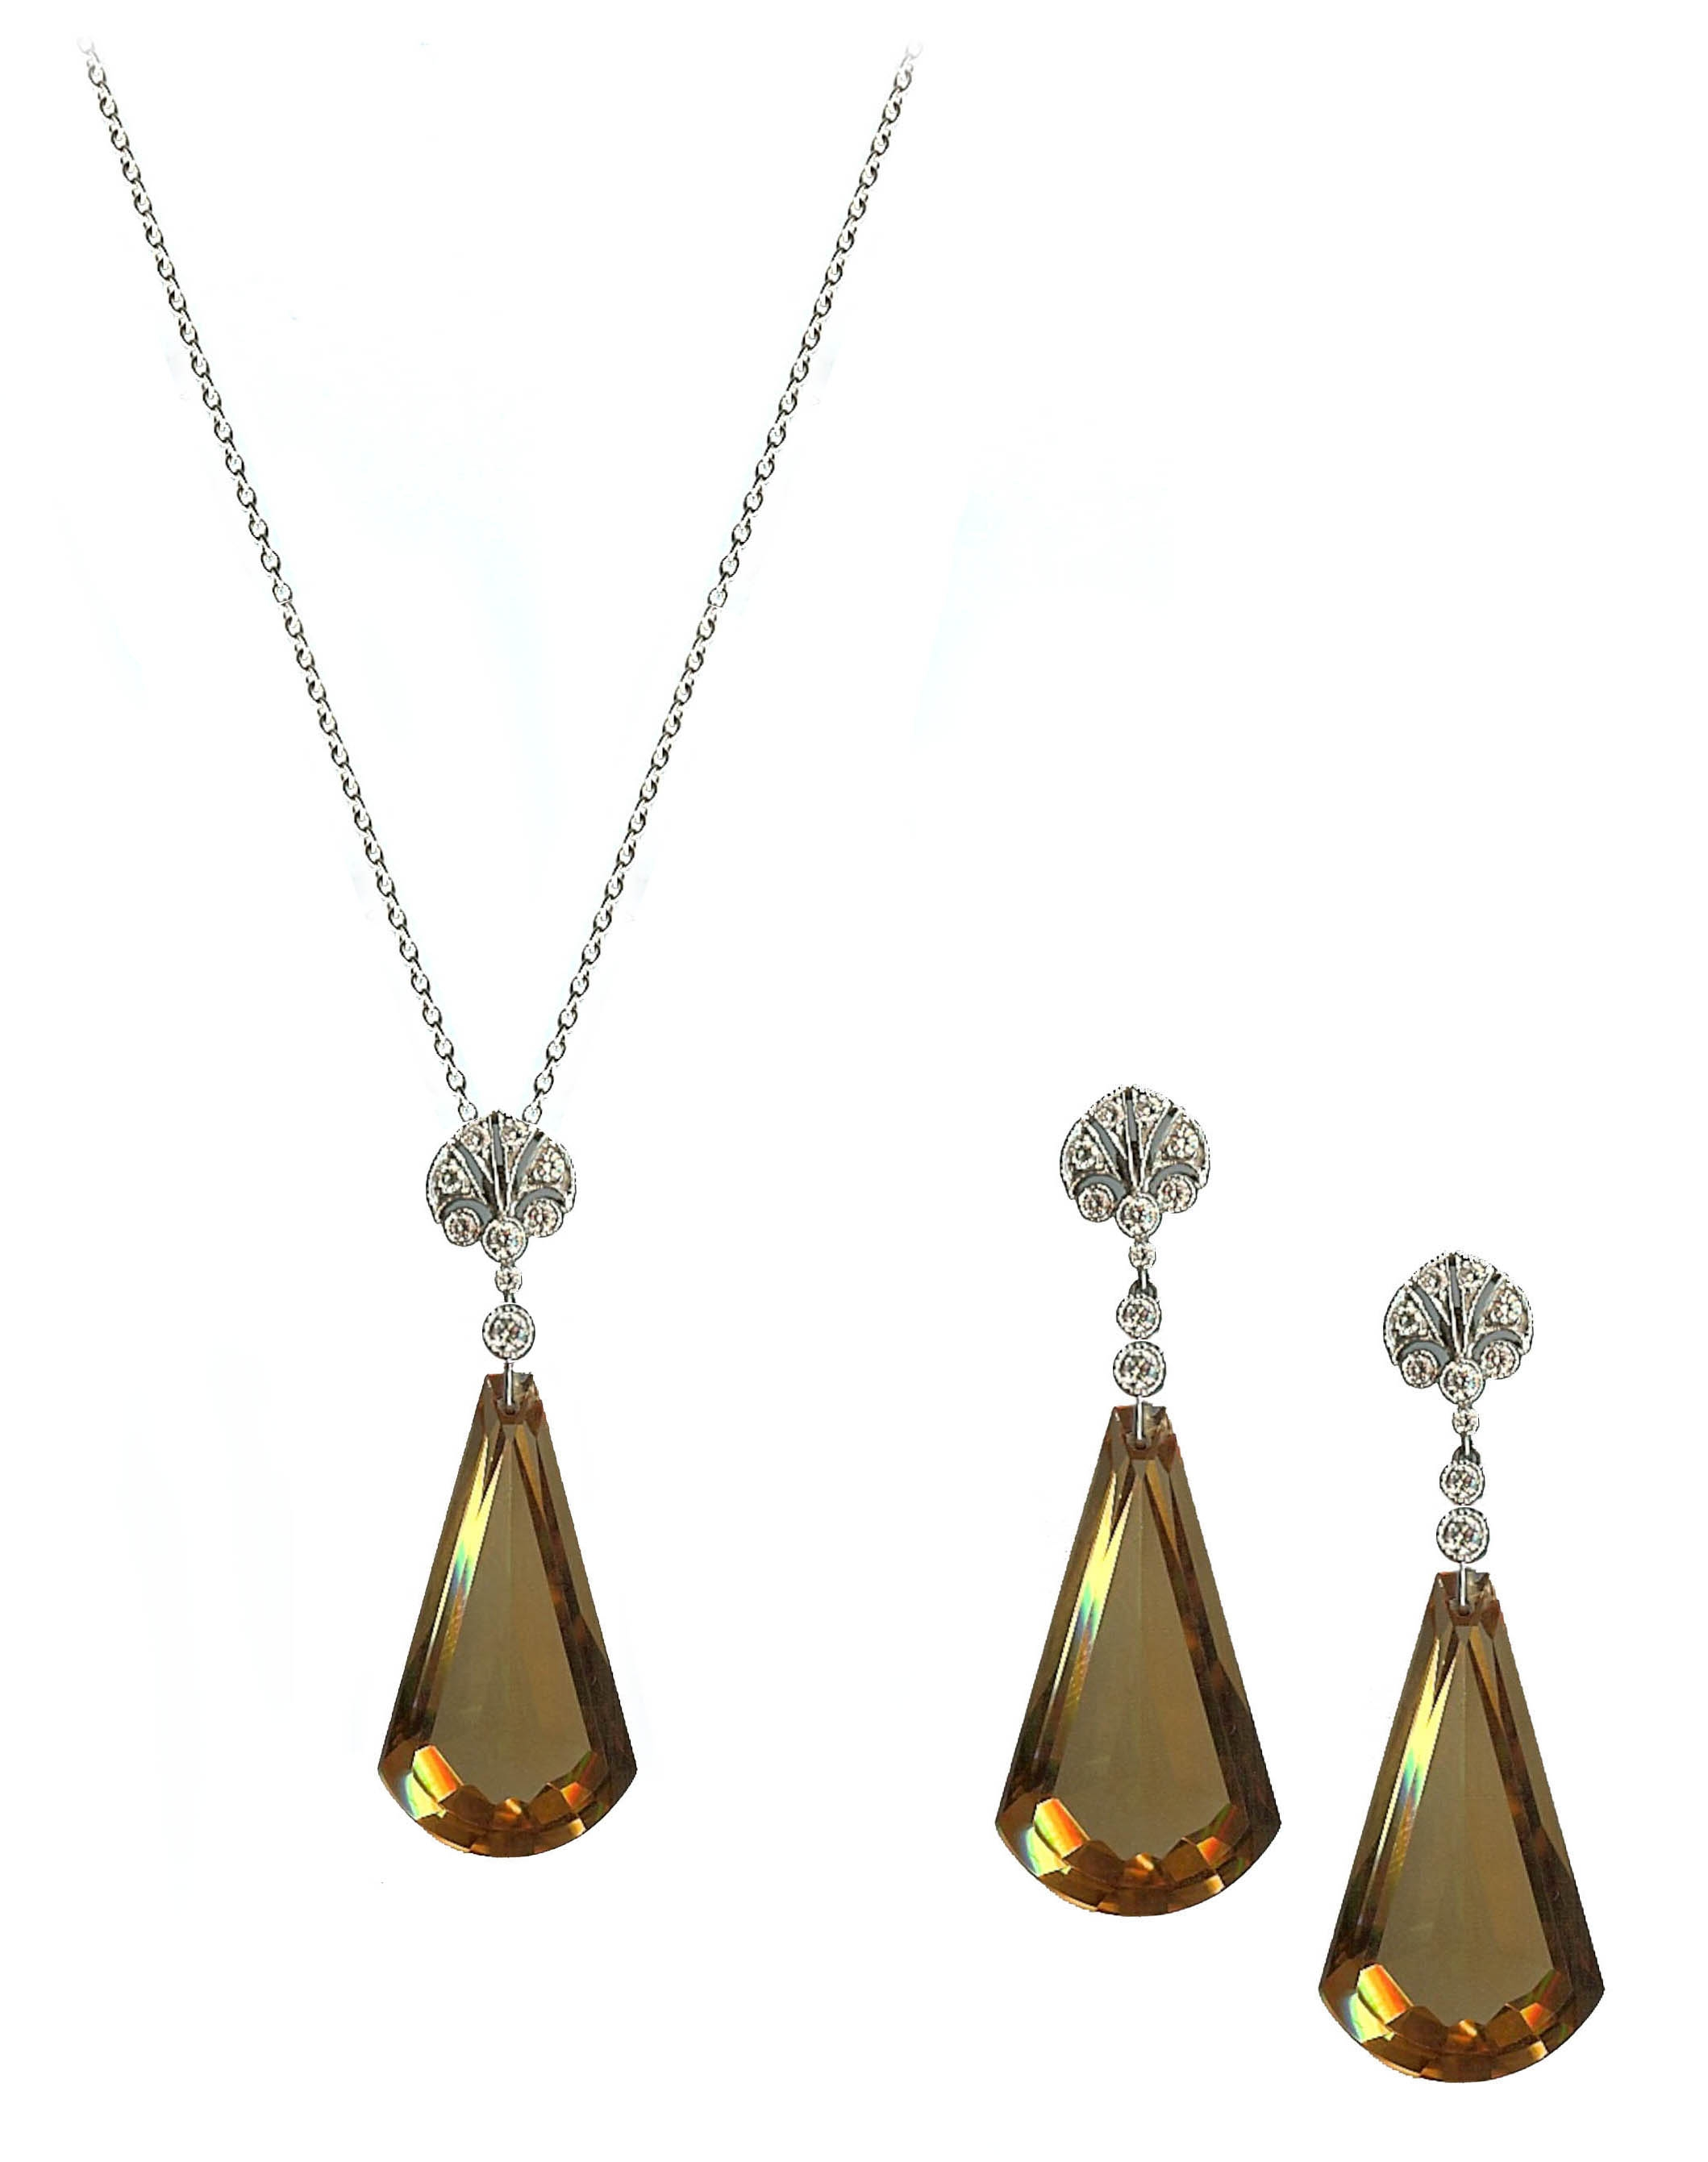 Citrine pendant and earrings